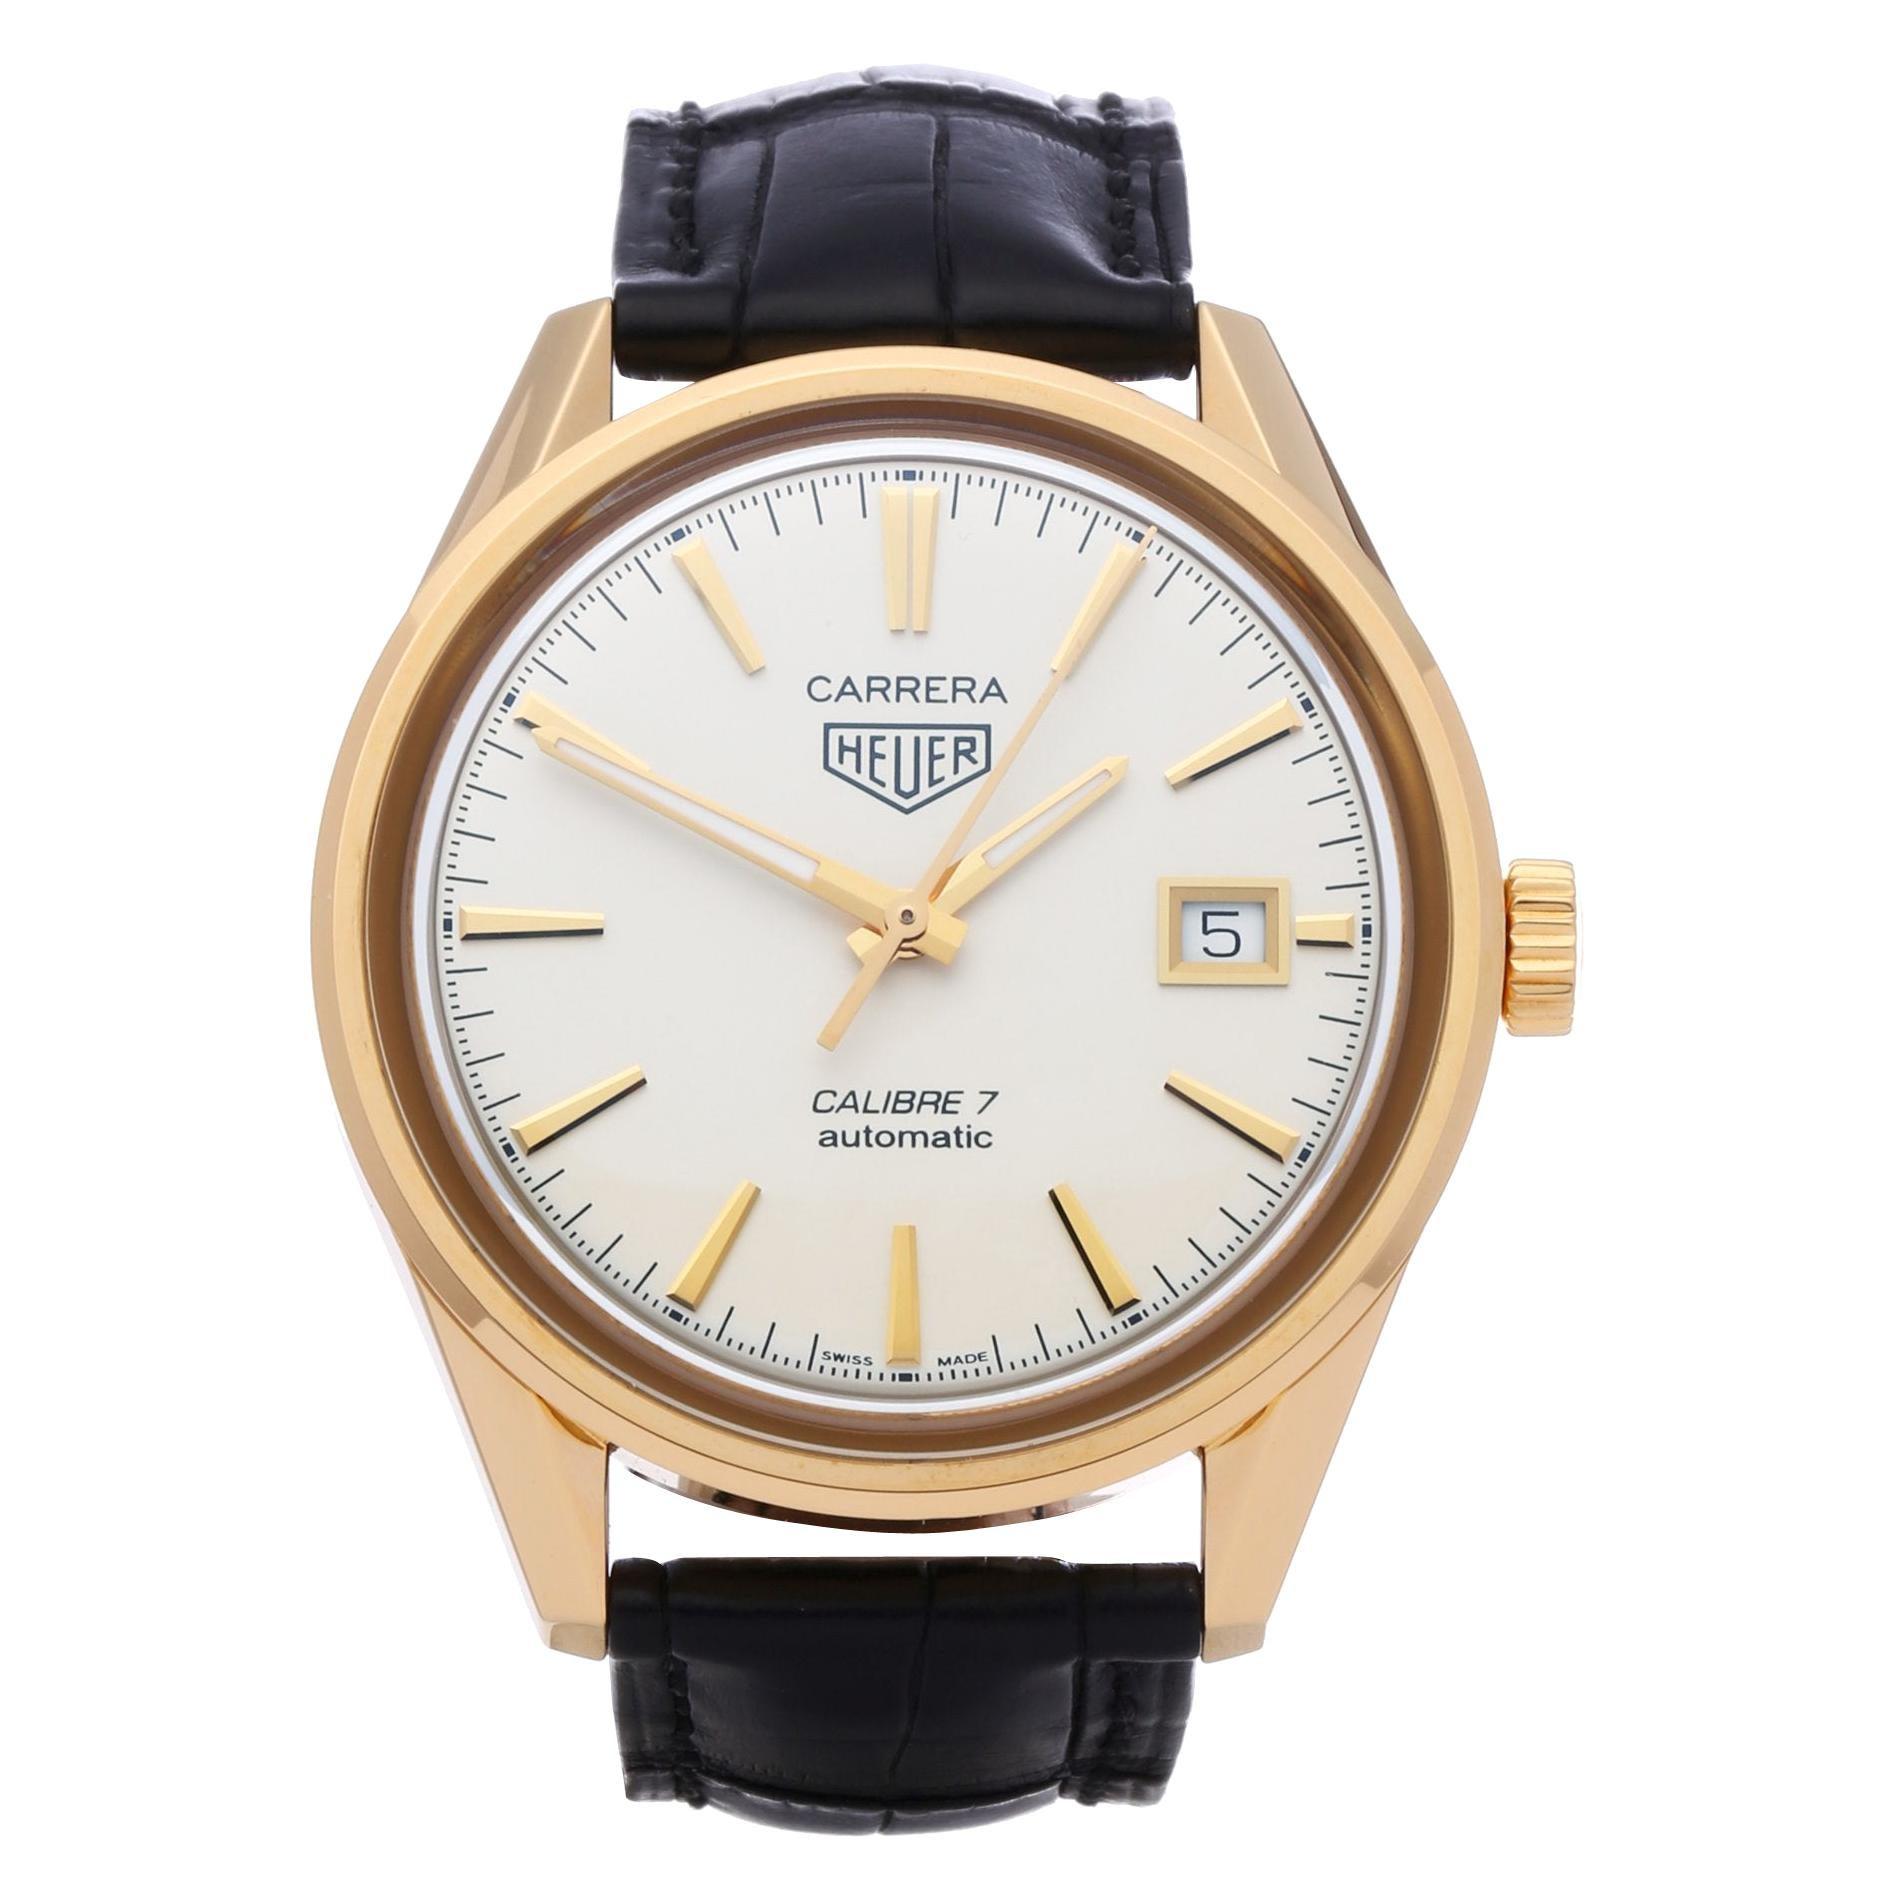 Heuer Carrera Calibre 7 WAR2140 Men's Yellow Gold Watch